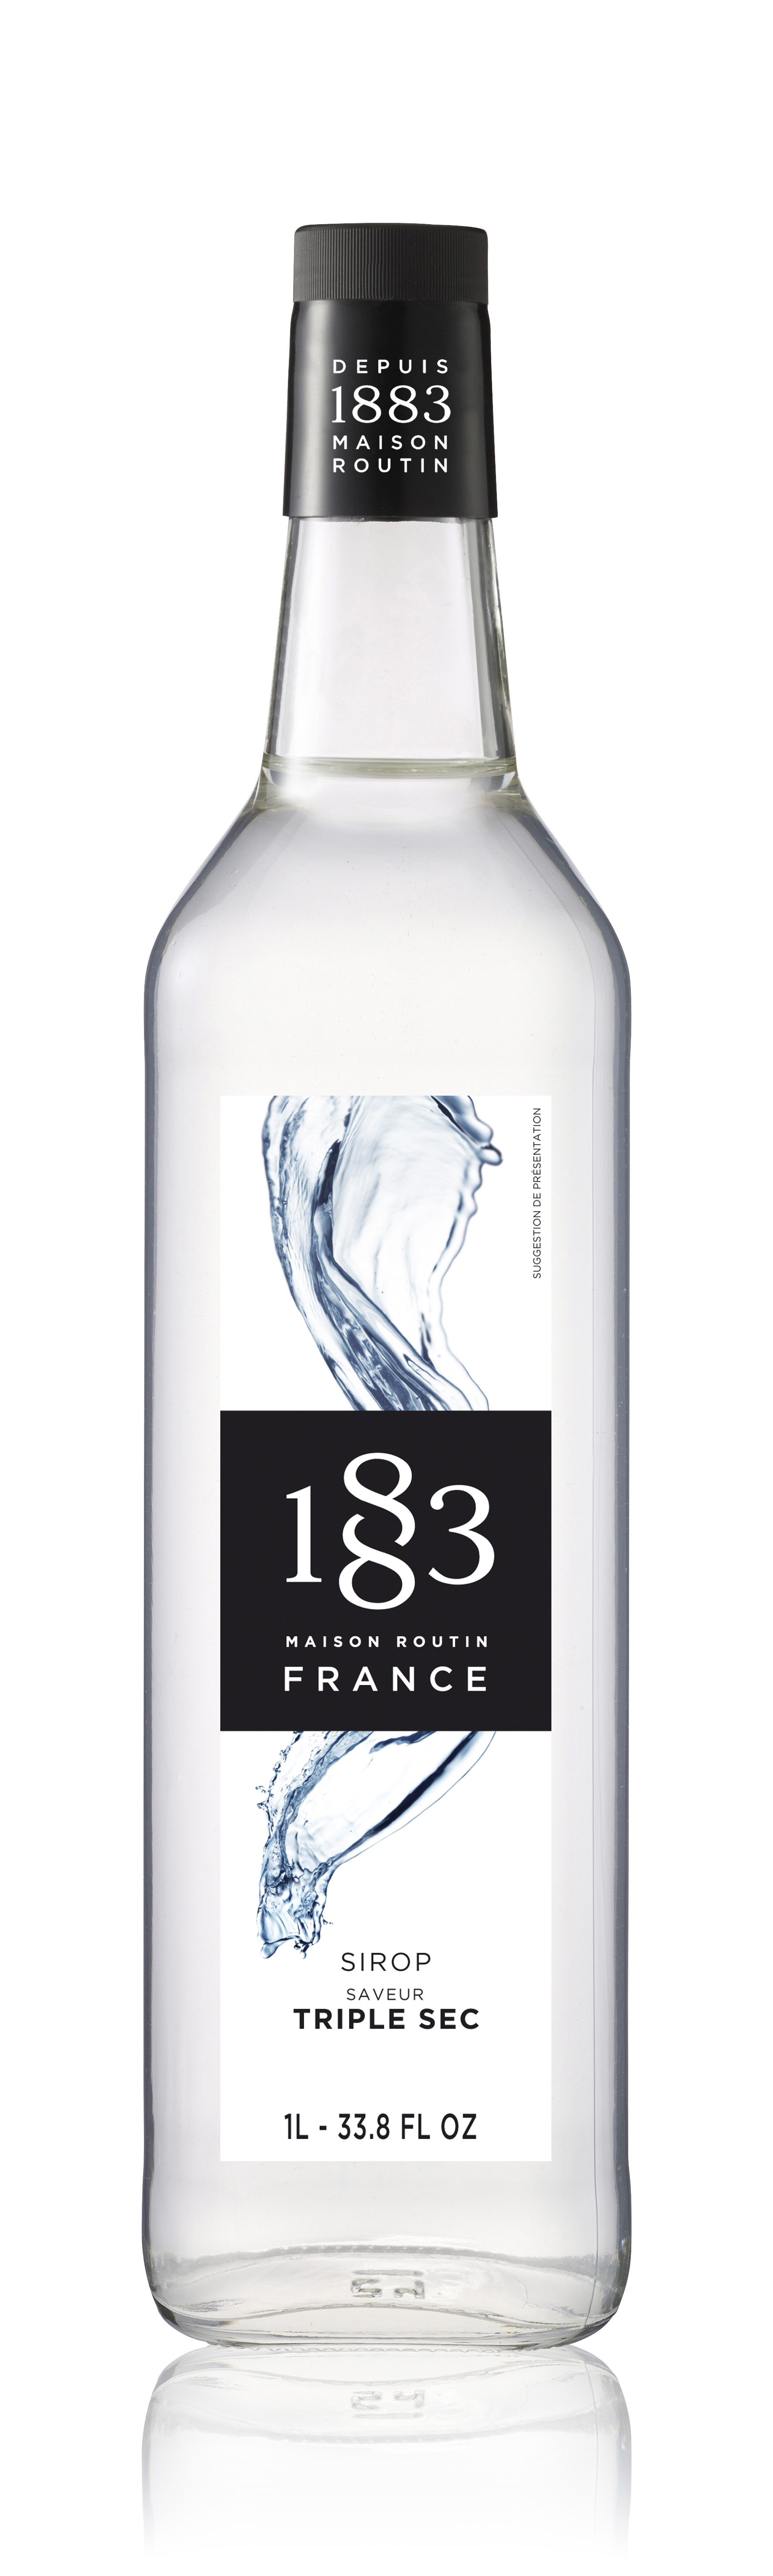 1883 Syrup Triple Sec 1L Glass Bottle